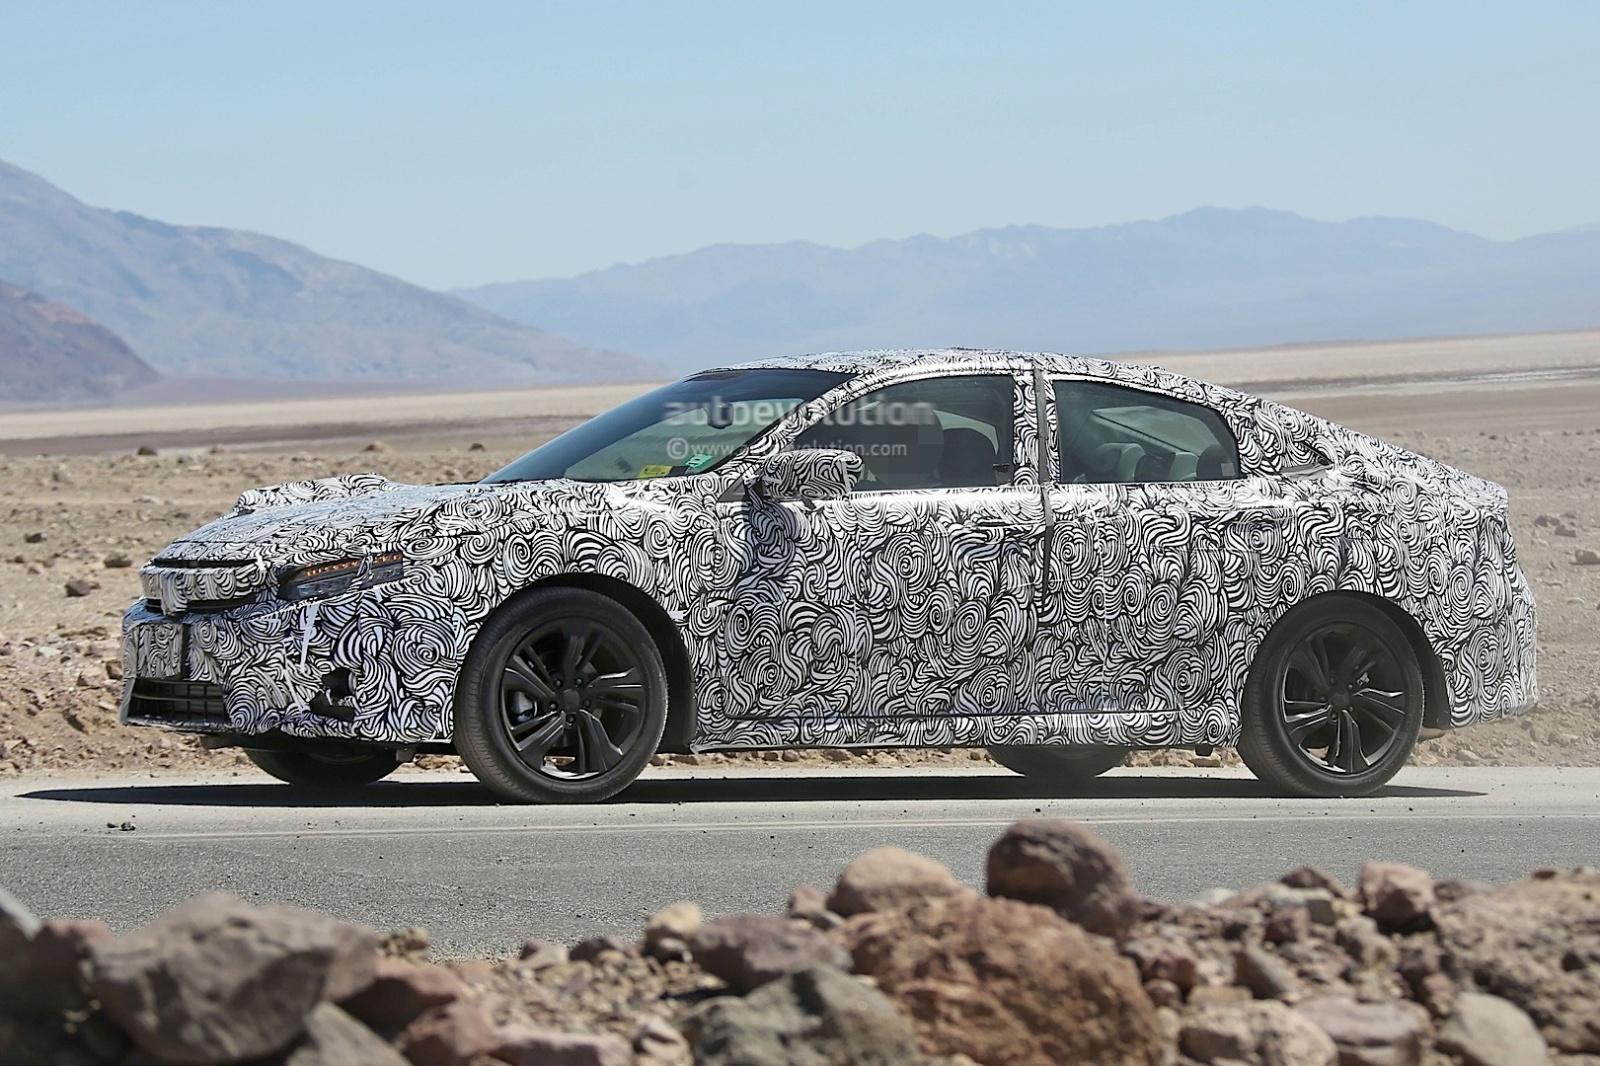 spyshots-next-gen-2017-honda-civic-sedan-interior-revealed-new-exterior-details-shown_32